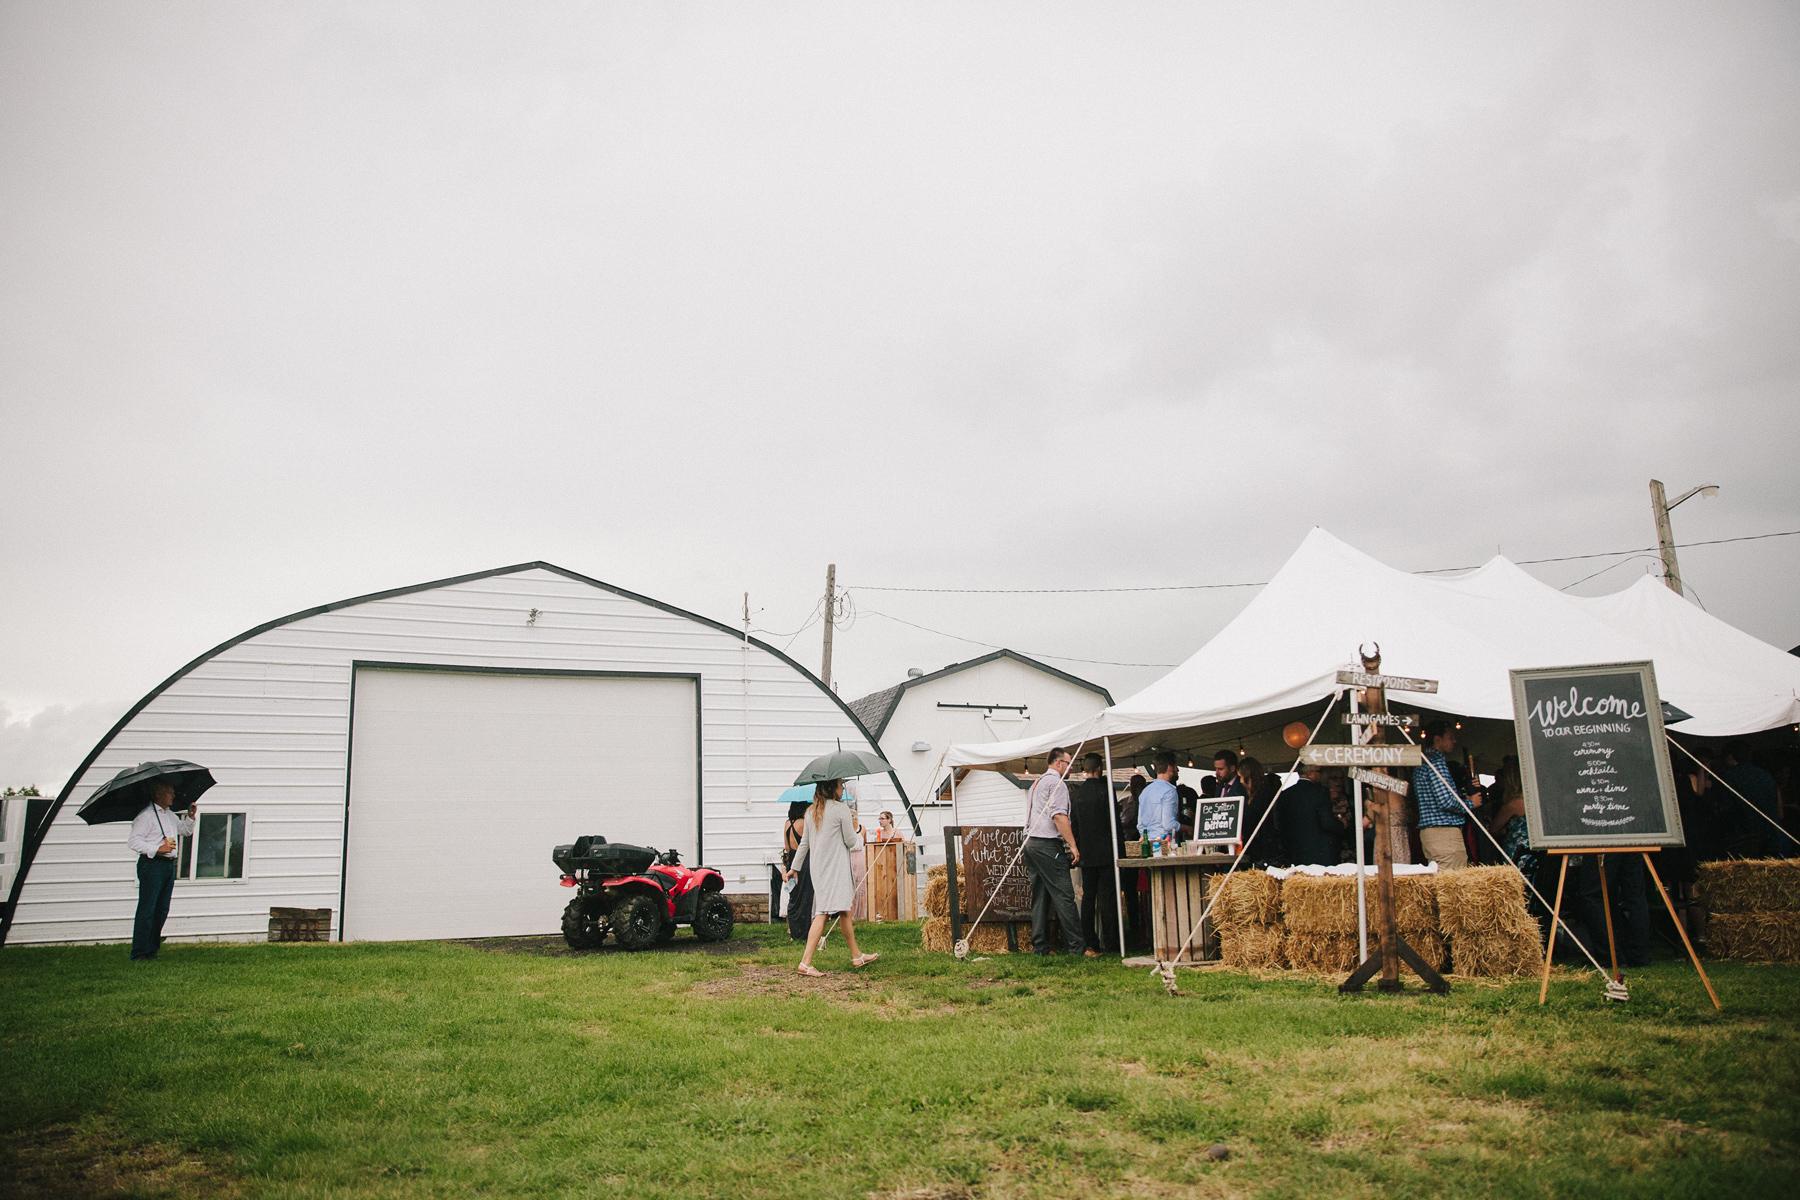 alberta-farm-wedding-photographer-rp-wj-151.jpg